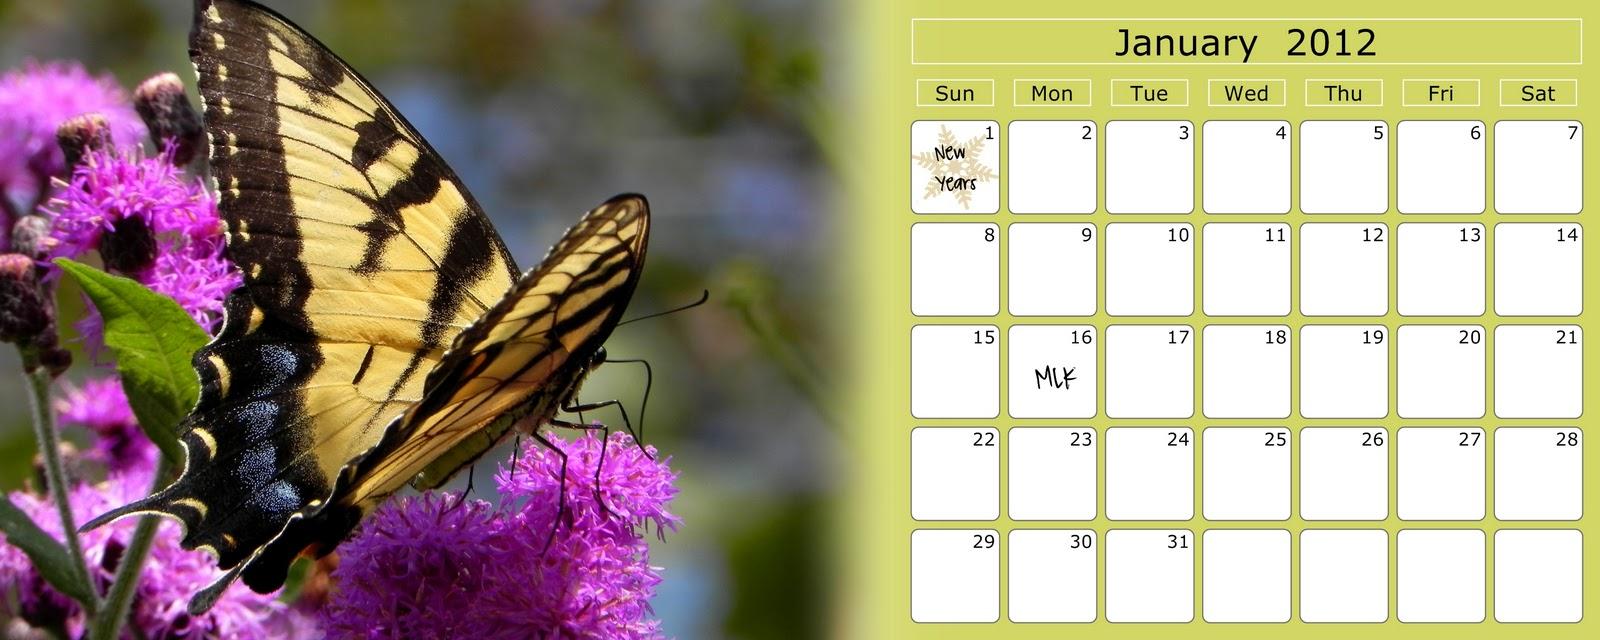 Power Of The Flower Butterfly Desk Calendar 2012